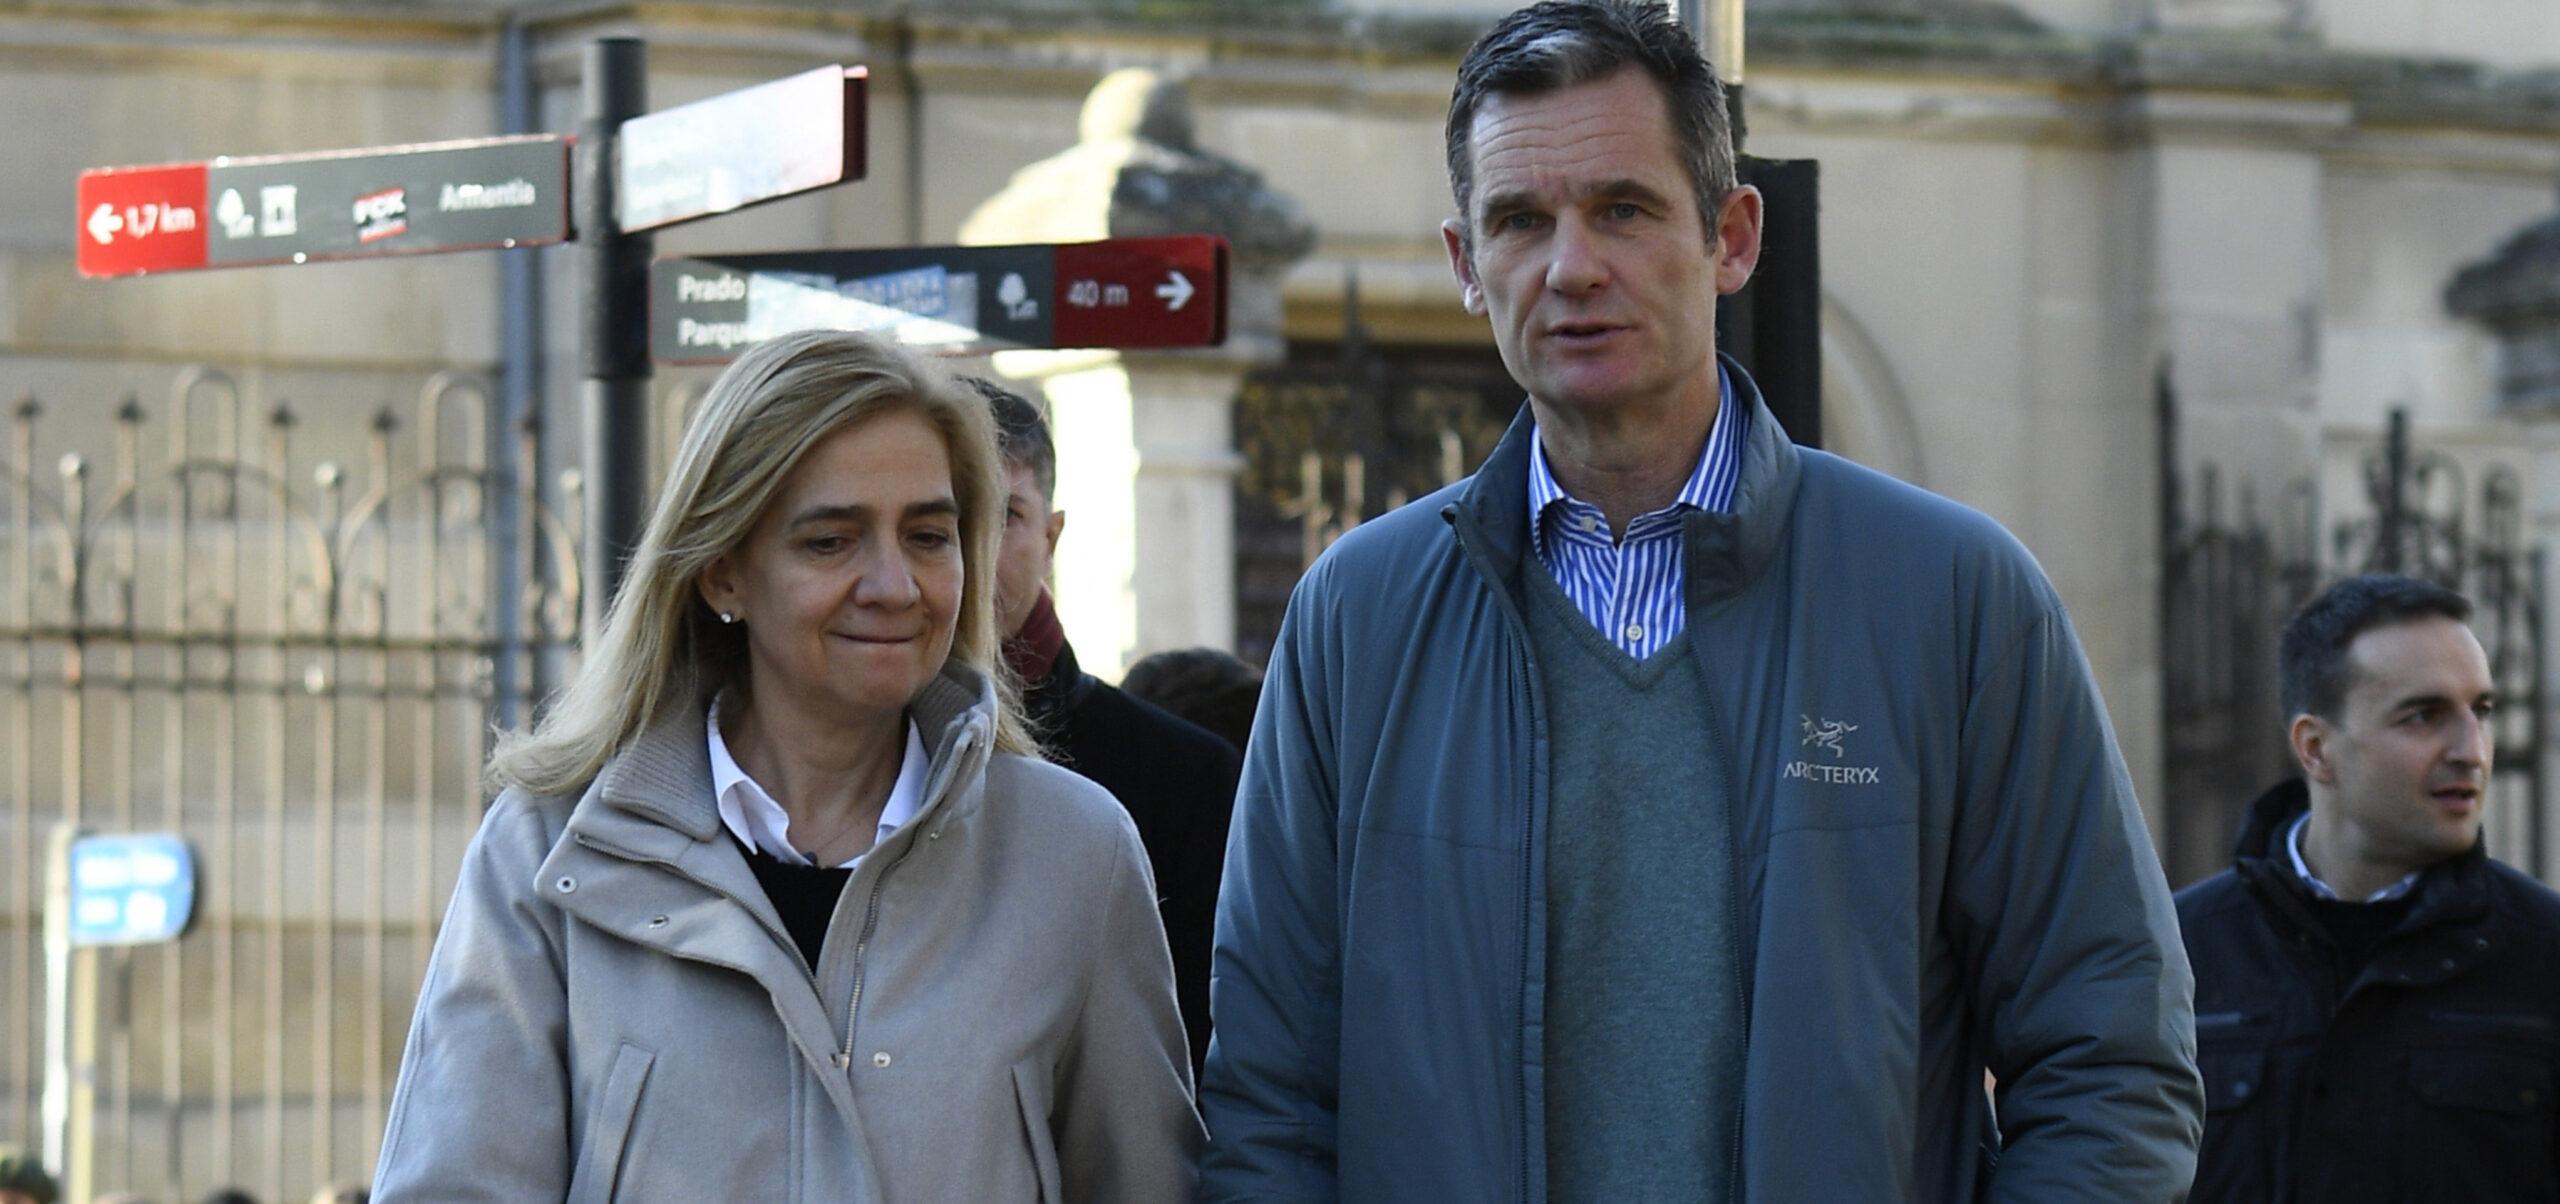 Cristina de Borbó i Iñaki Urdangarin, de passeig per Vitòria / Europa Press